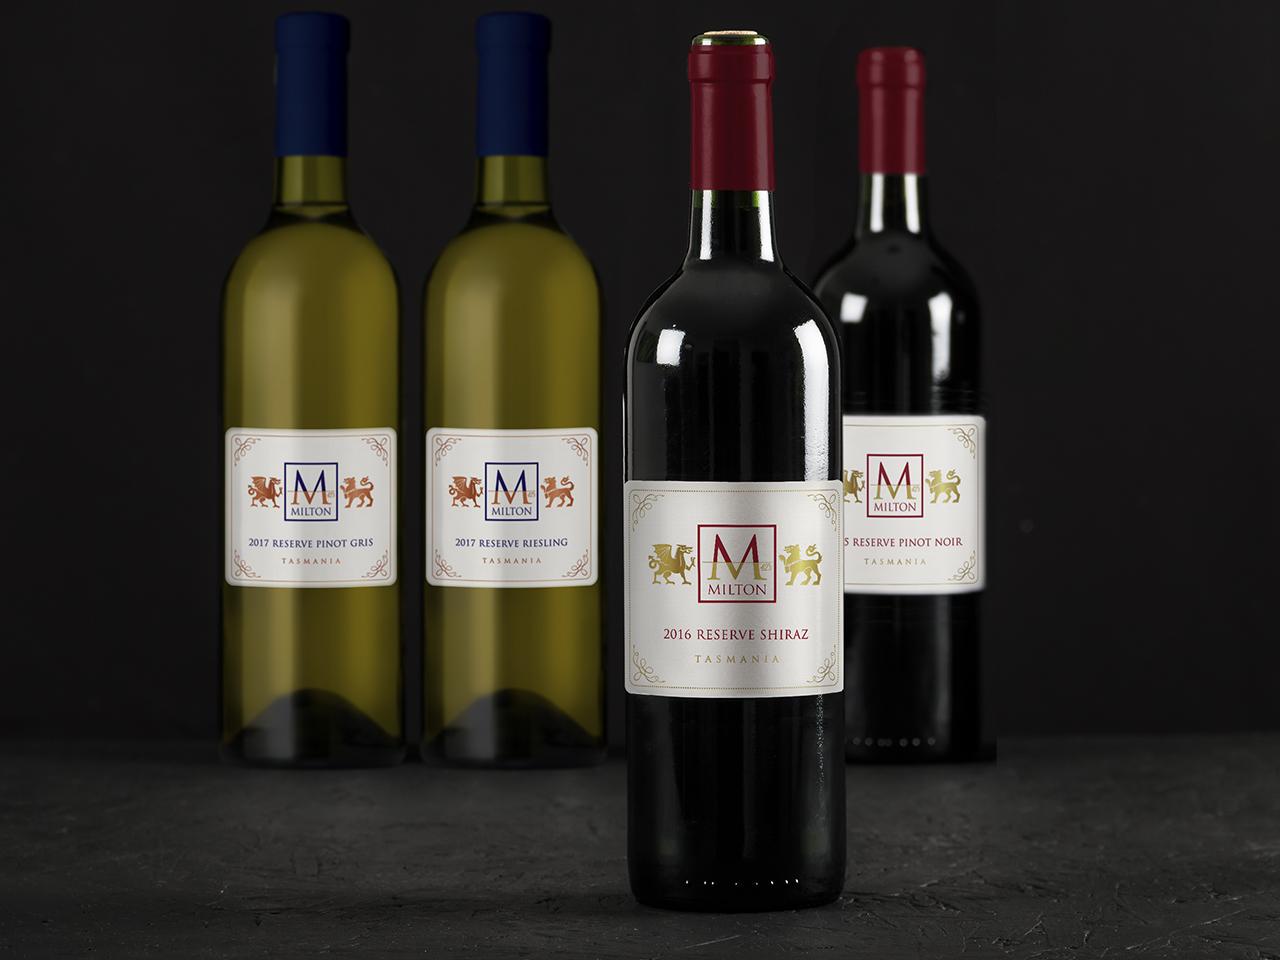 MILTON RESERVE - Branding, illustration, wine label packaging design design.